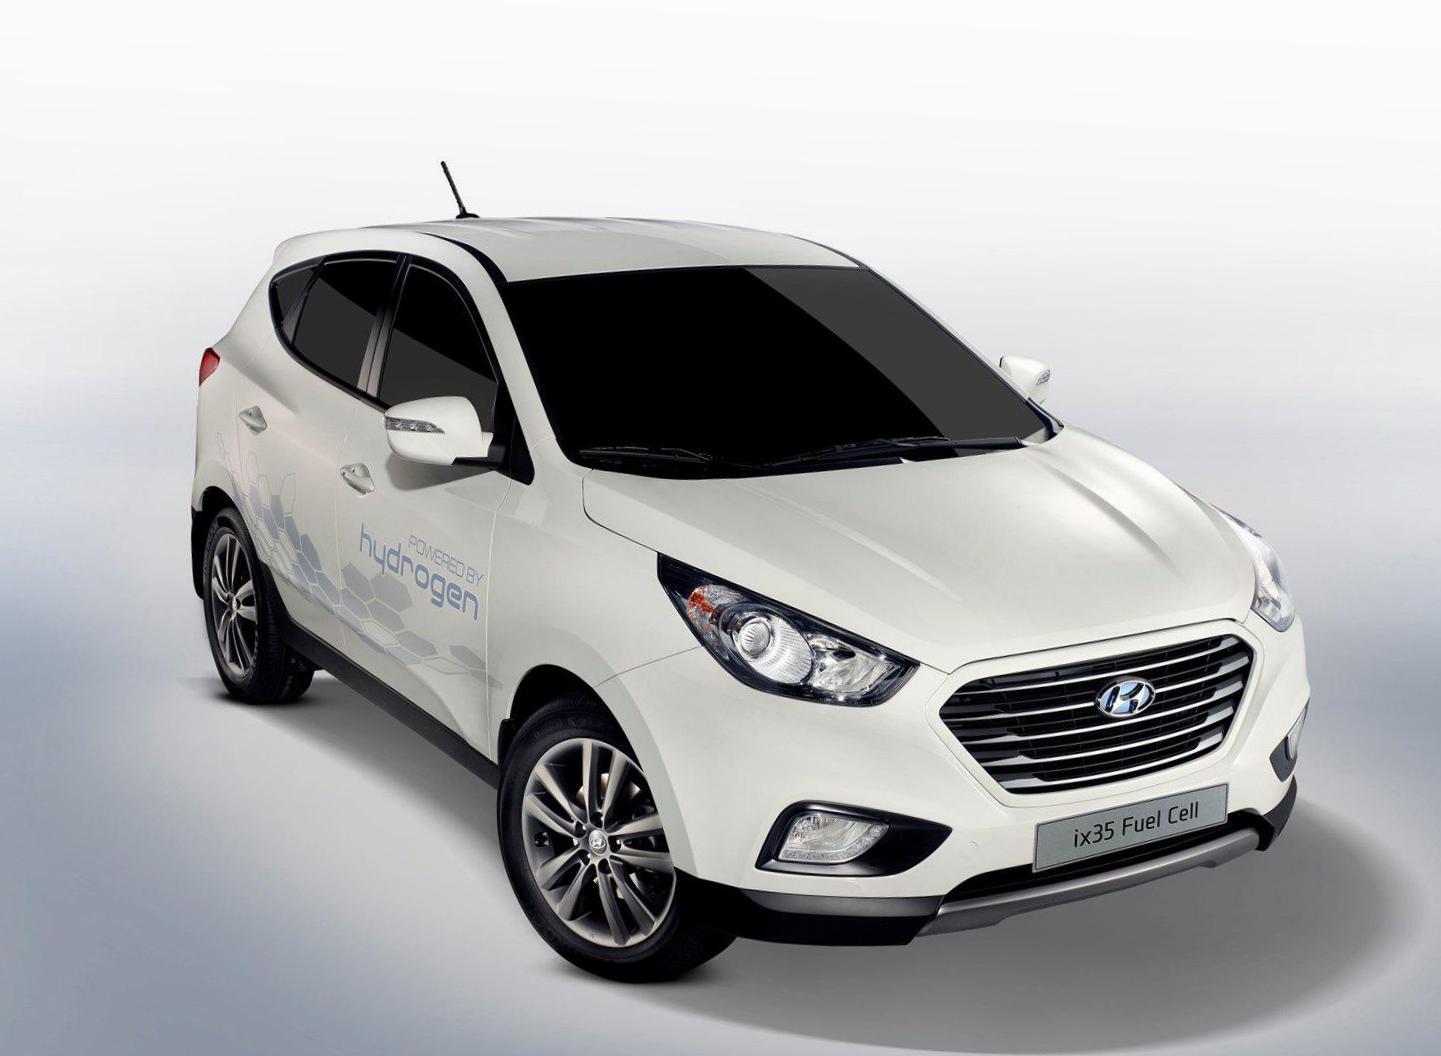 Hyundai ix35 Fuel Cell Photos and Specs  Photo: Hyundai ix35 Fuel